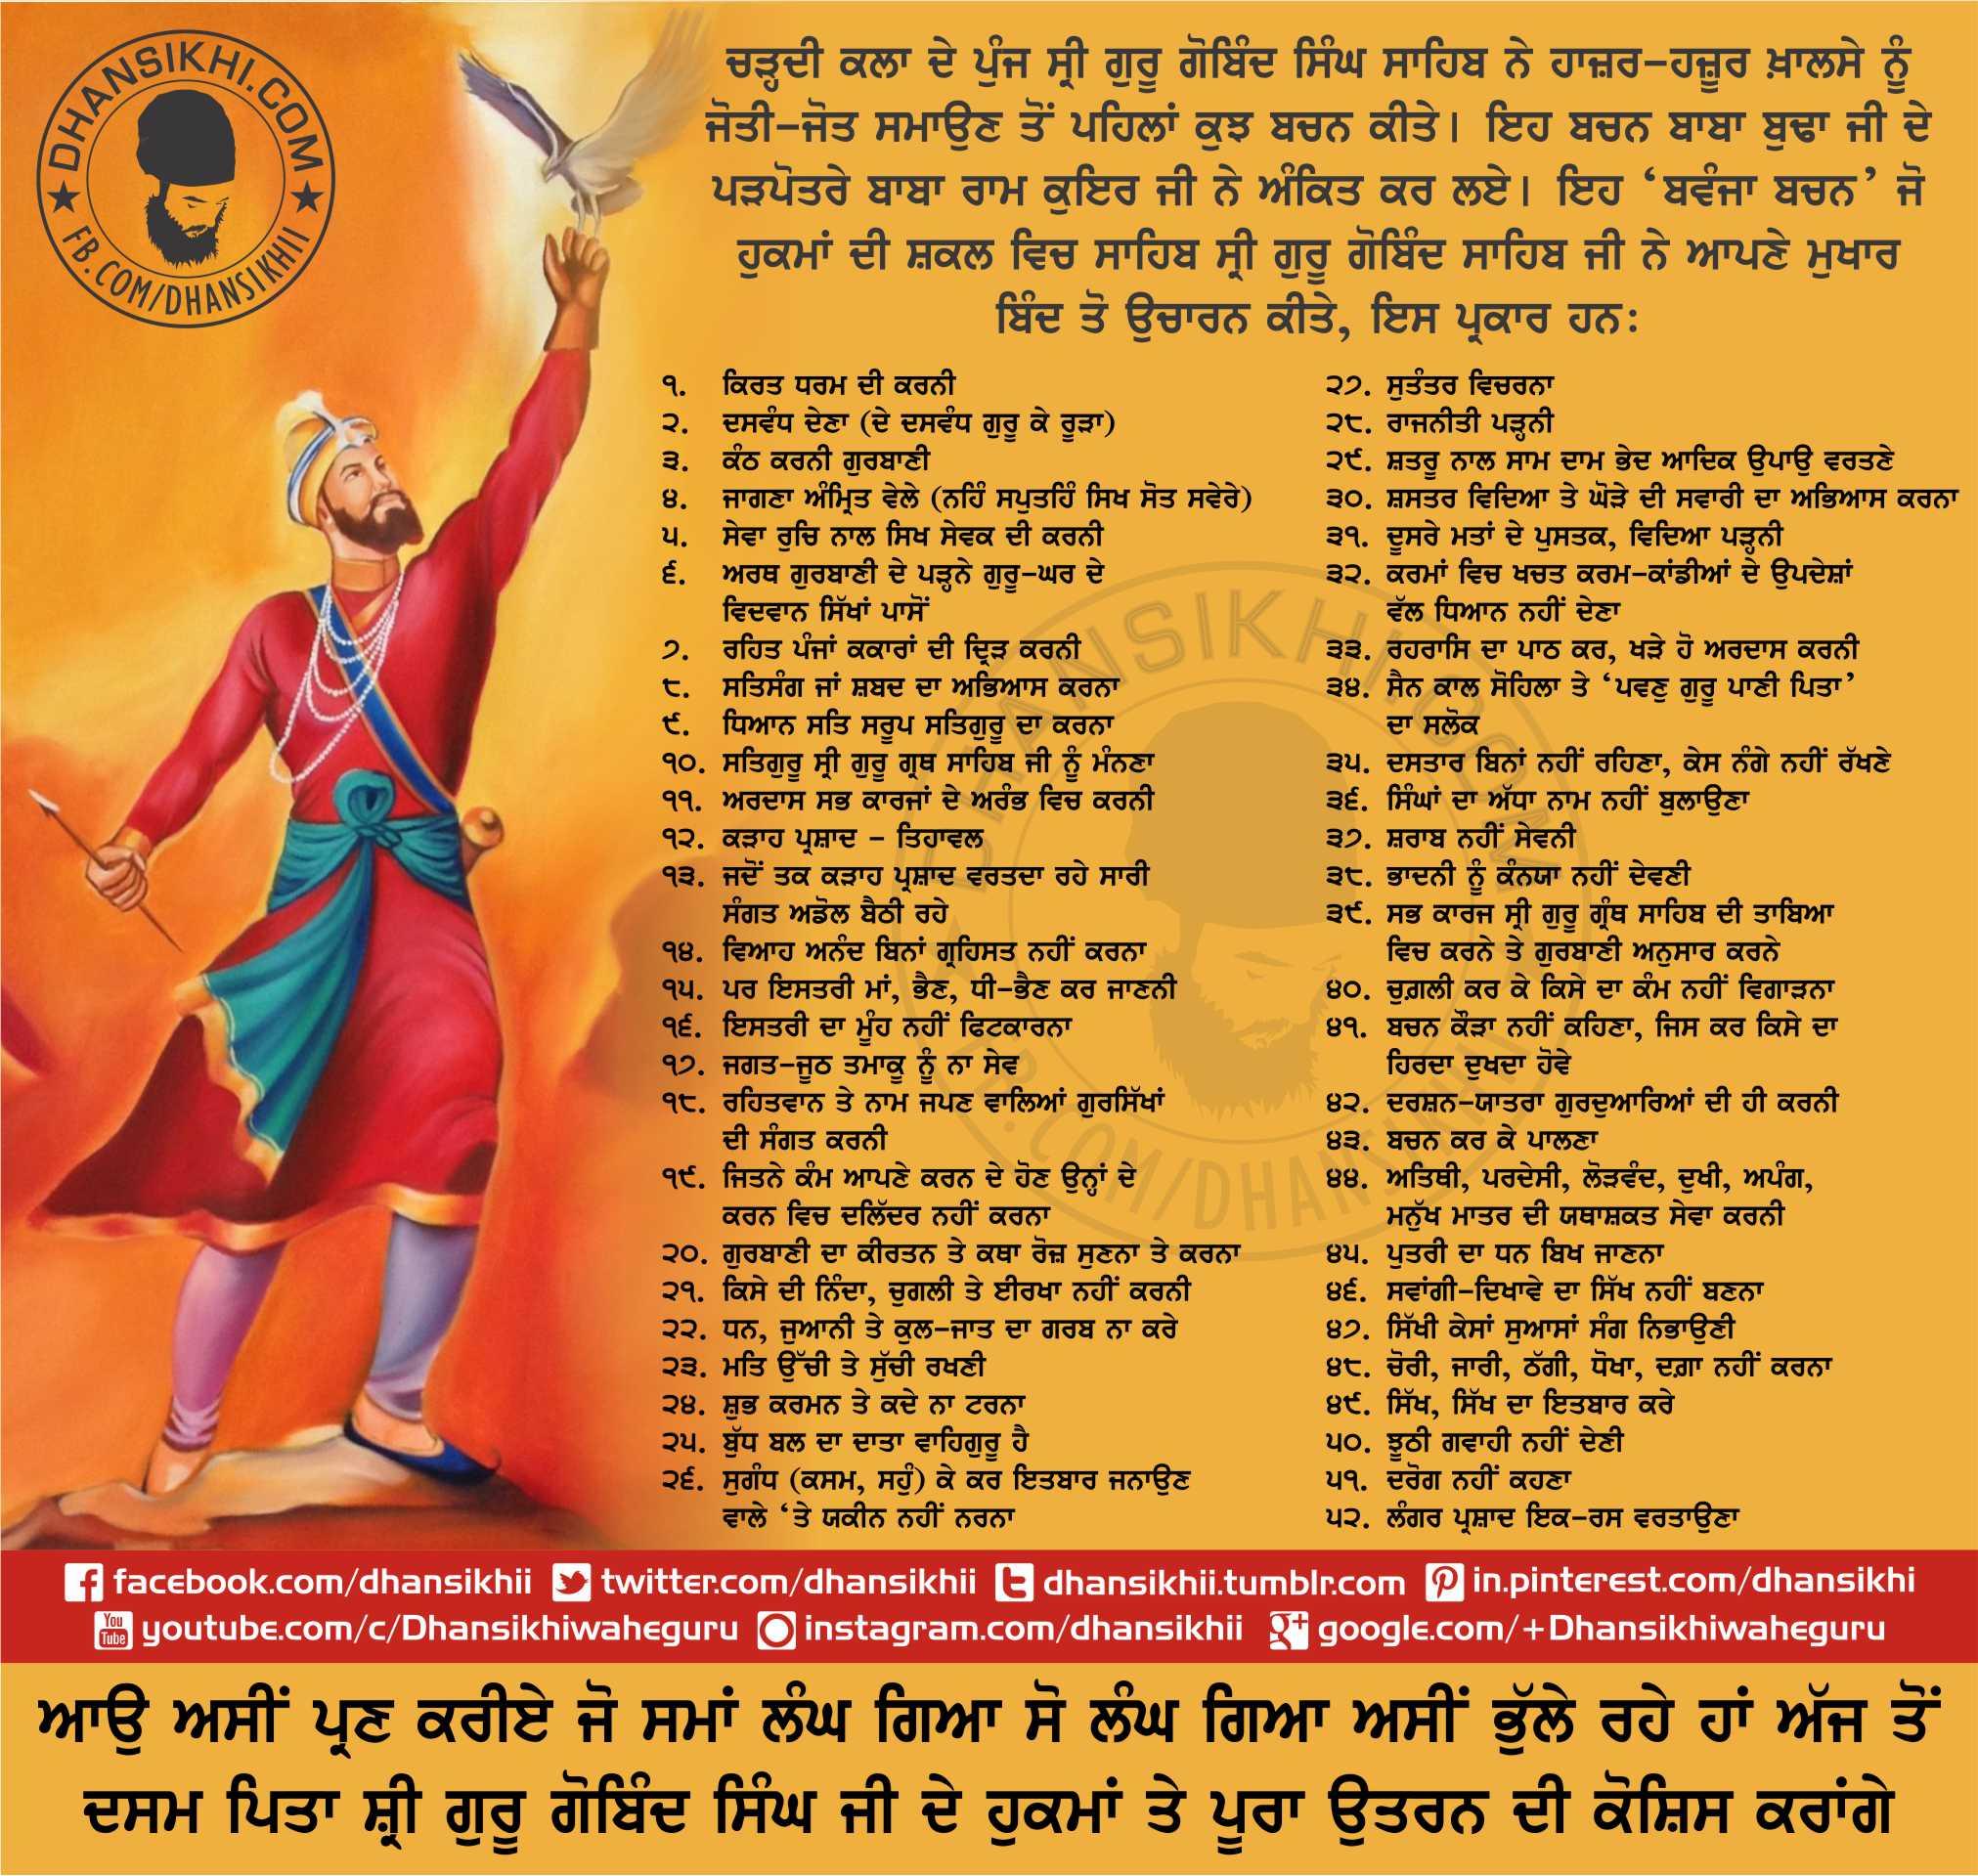 52 Bachan Of Sri Guru Gobind Singh Ji Dhansikhi